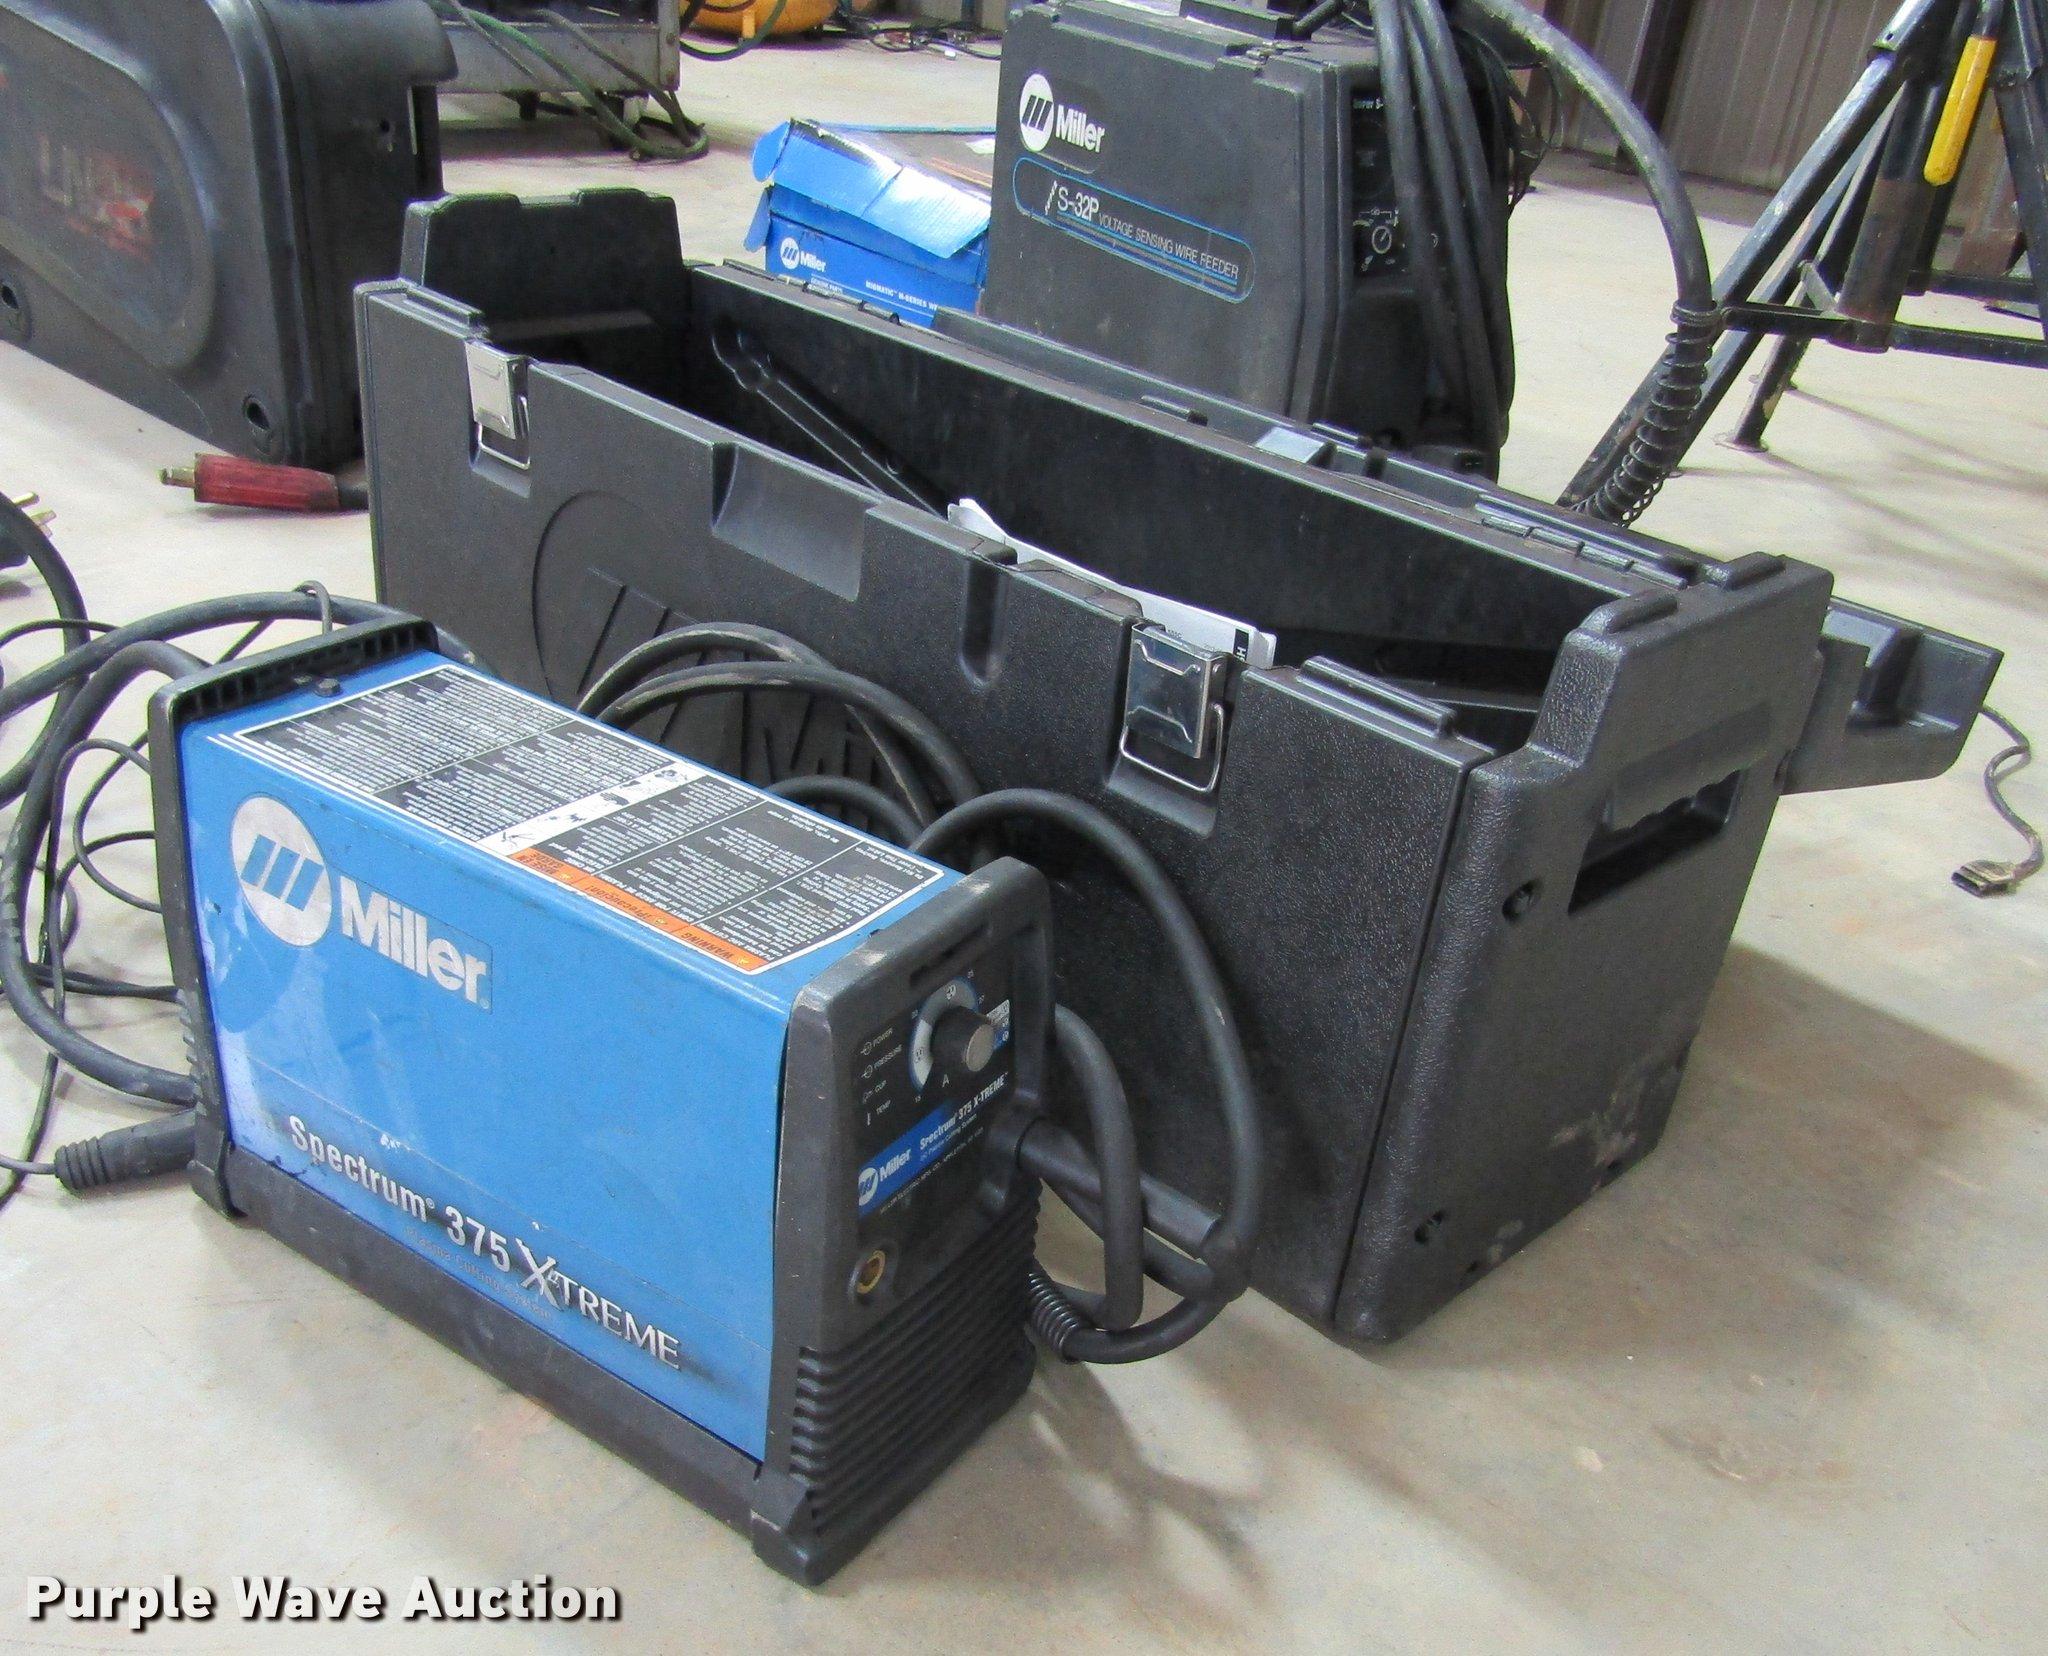 Miller Spectrum 375 >> Miller Spectrum 375 Extreme Plasma Cutter Item Az9384 So